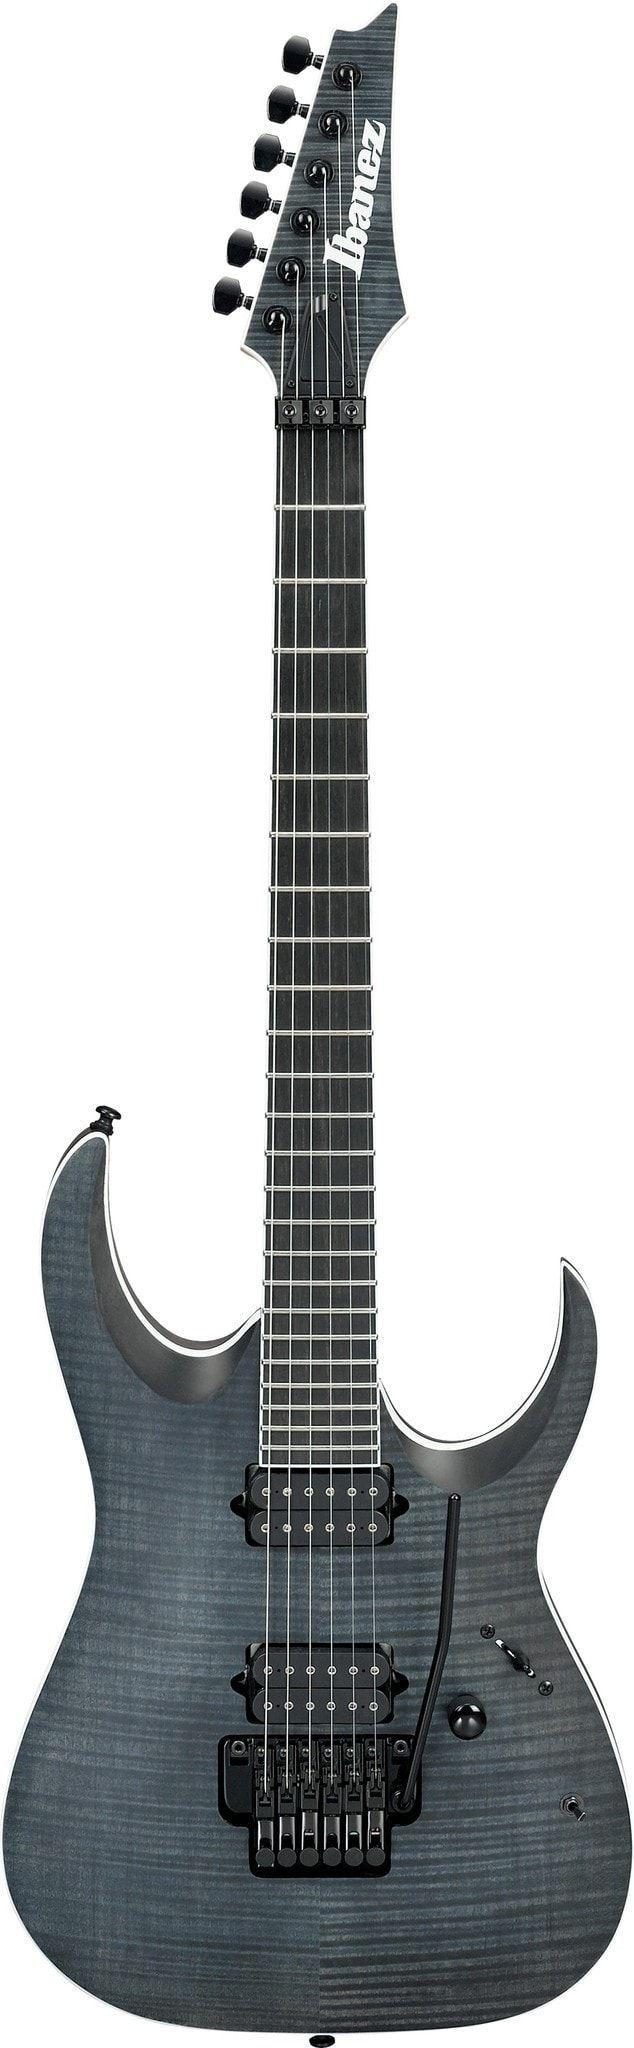 Ibanez Rgaix6fmt Iron Label Electric Guitar Electric Guitar Cool Electric Guitars Beginner Electric Guitar